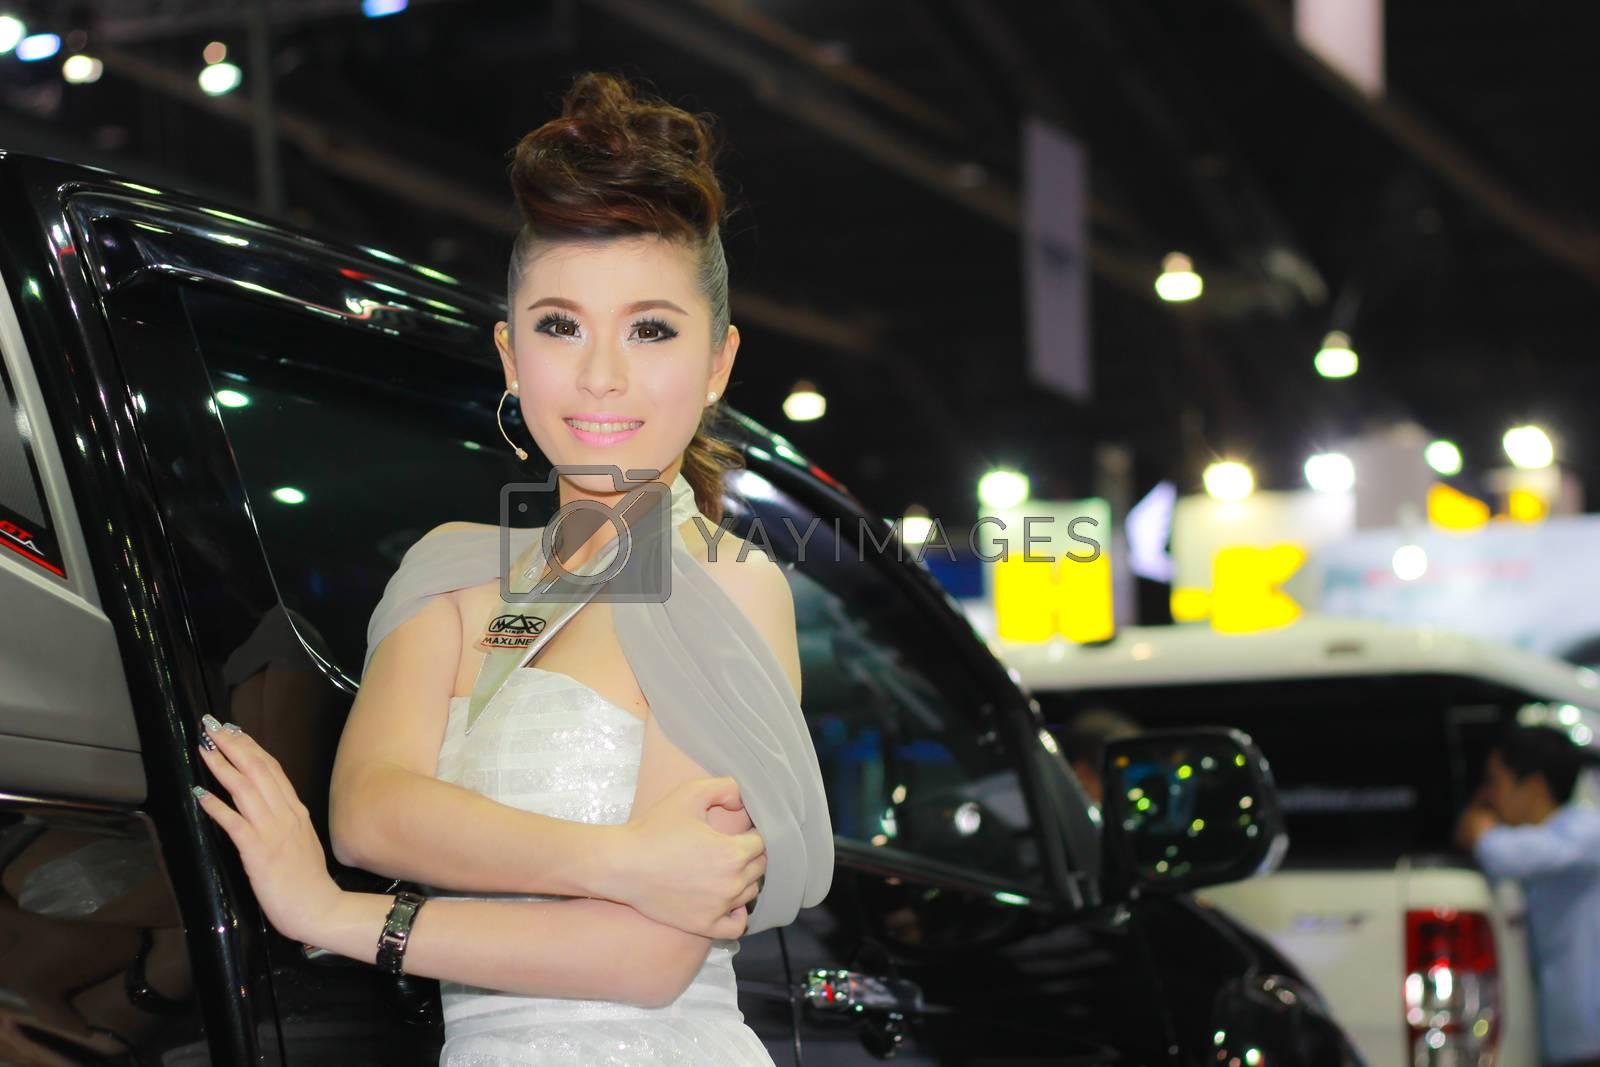 An Unidentified female presenter pose in Bangkok International Motor Show by redthirteen